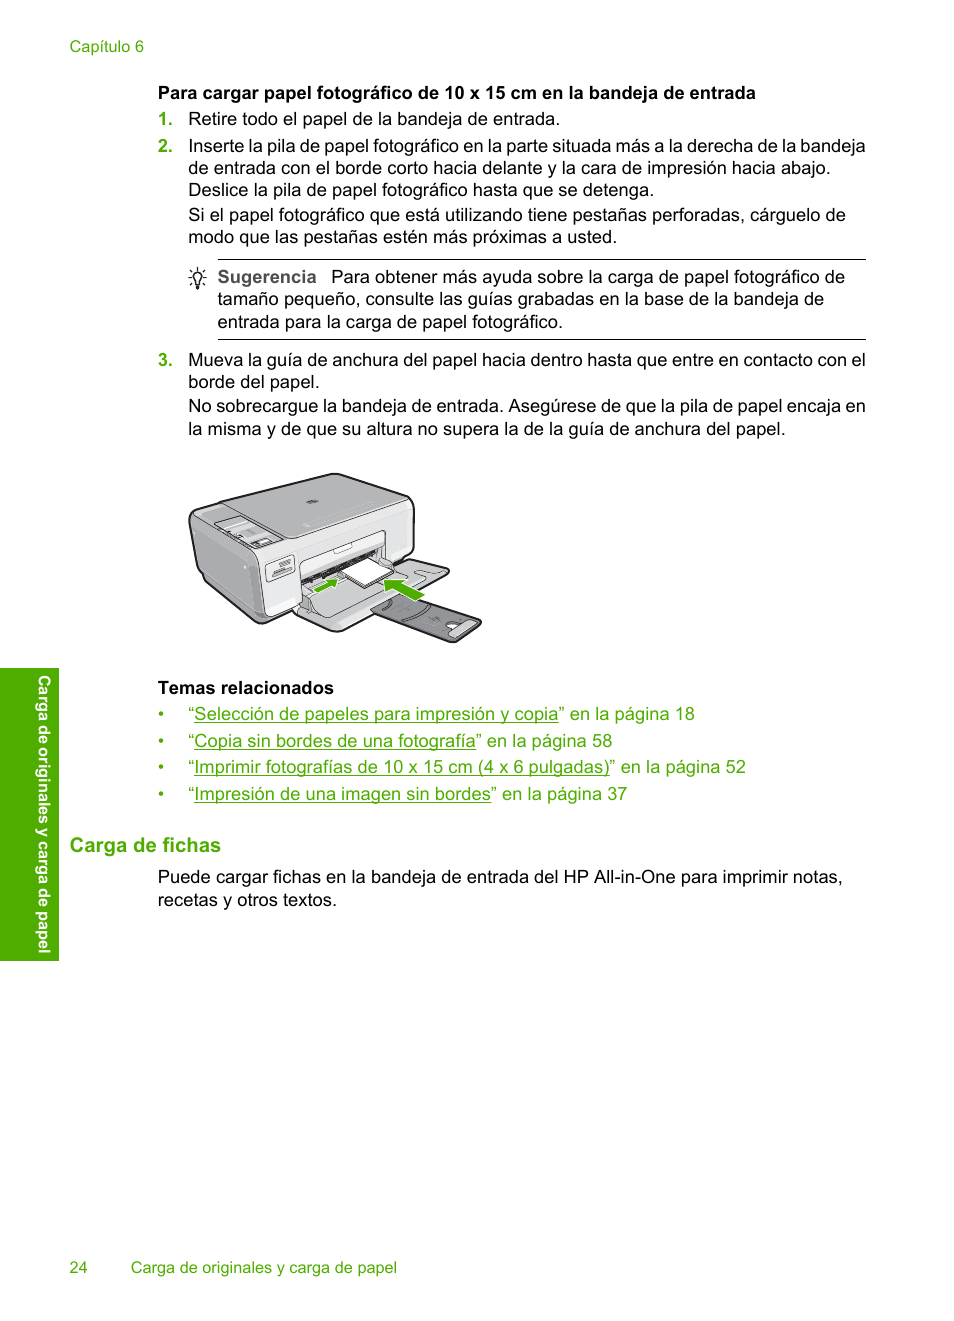 Hp C4280 Manual Power Lawn L S Garden Light Lazada Malaysia On Lights No Wiring Install Photosmart Without Cd Array Carga De Fichas Impresora Todo En Uno Rh Pdfmanuales Com